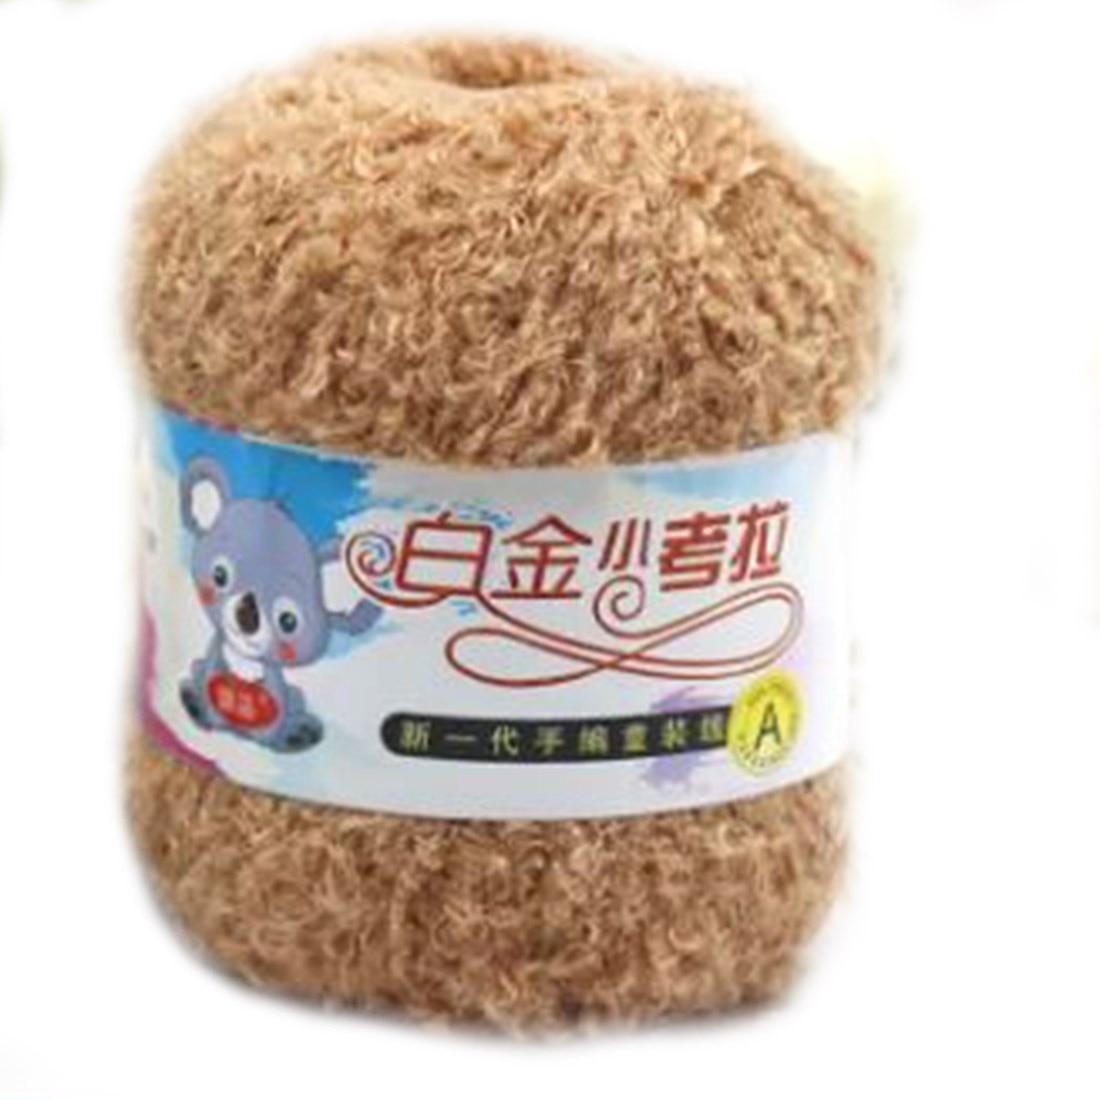 Велика мека топла дуга коса памучна - Уметност, занатство и шивање - Фотографија 6